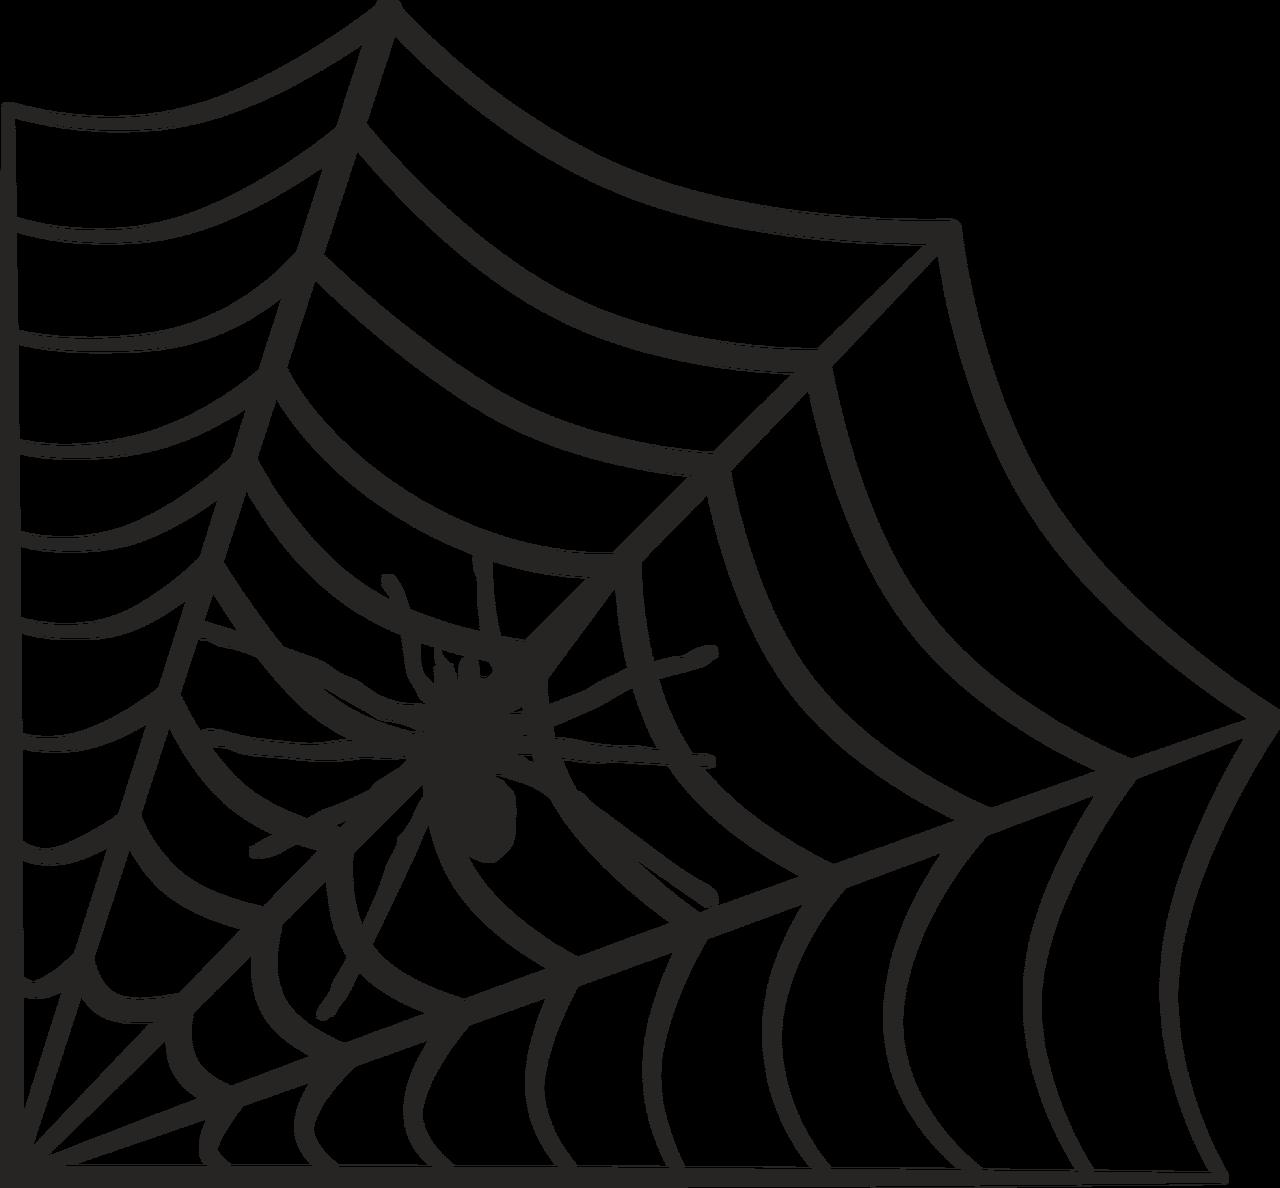 Spider Web #4 SVG Cut File